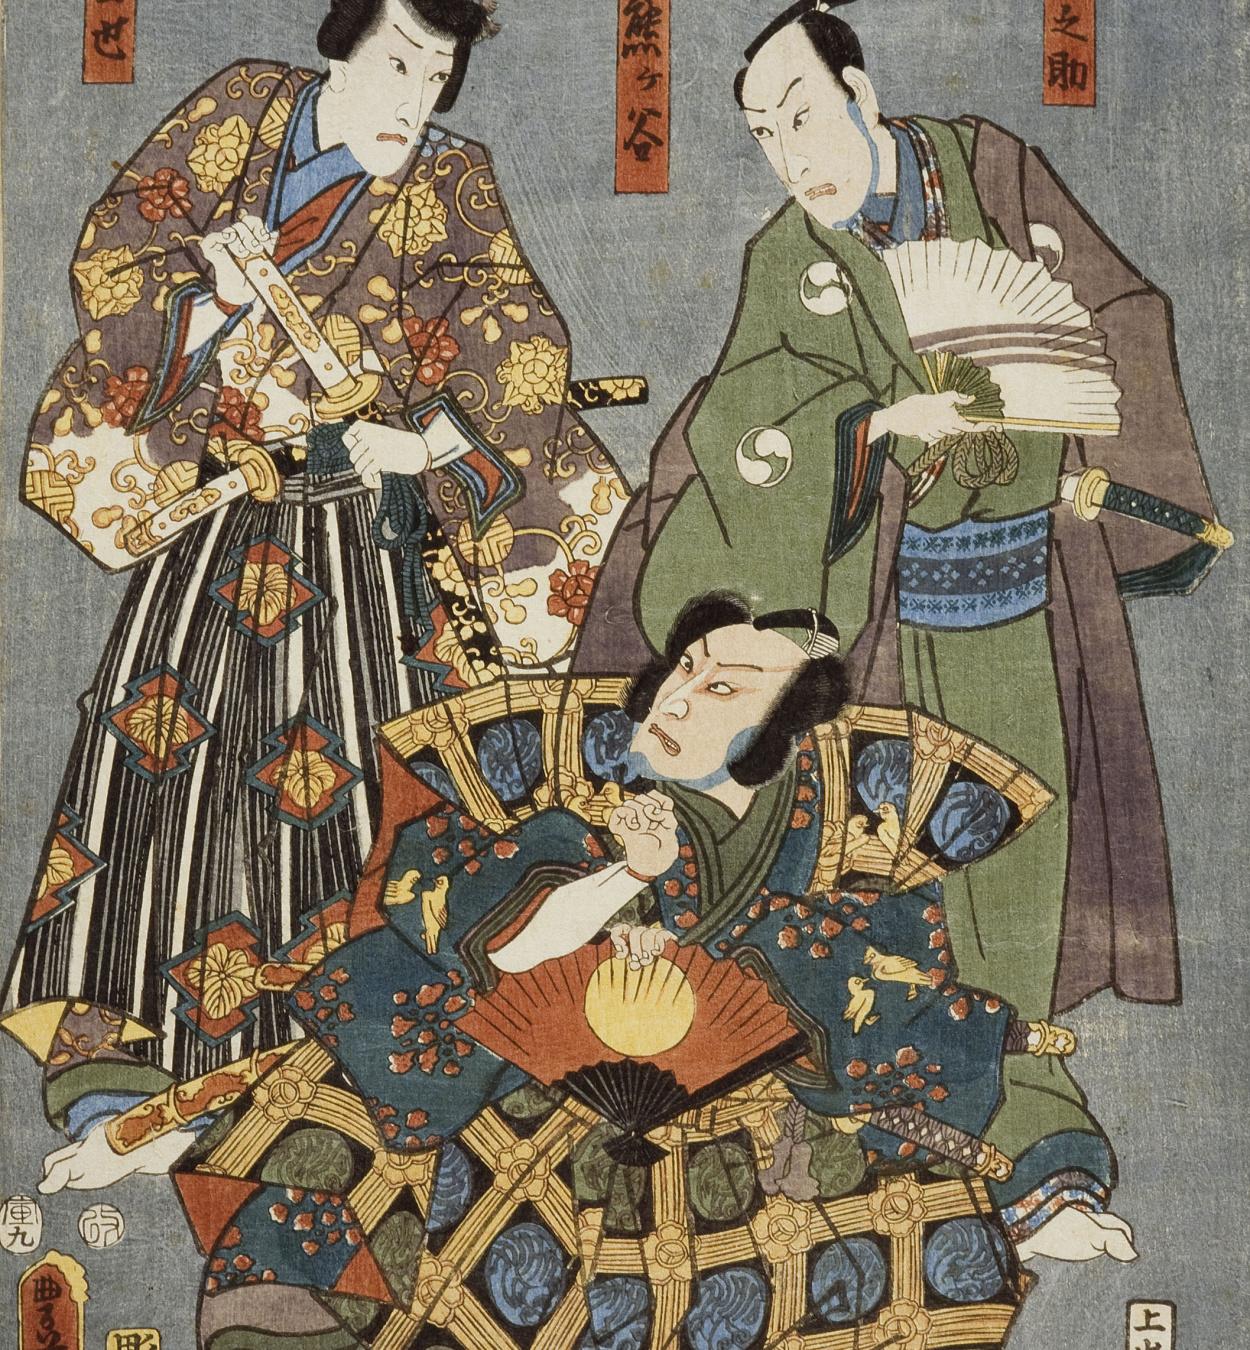 Utagawa Kunisada (Toyokuni III) - Yuranosuke, Kumagai and Jiraiya - 1854